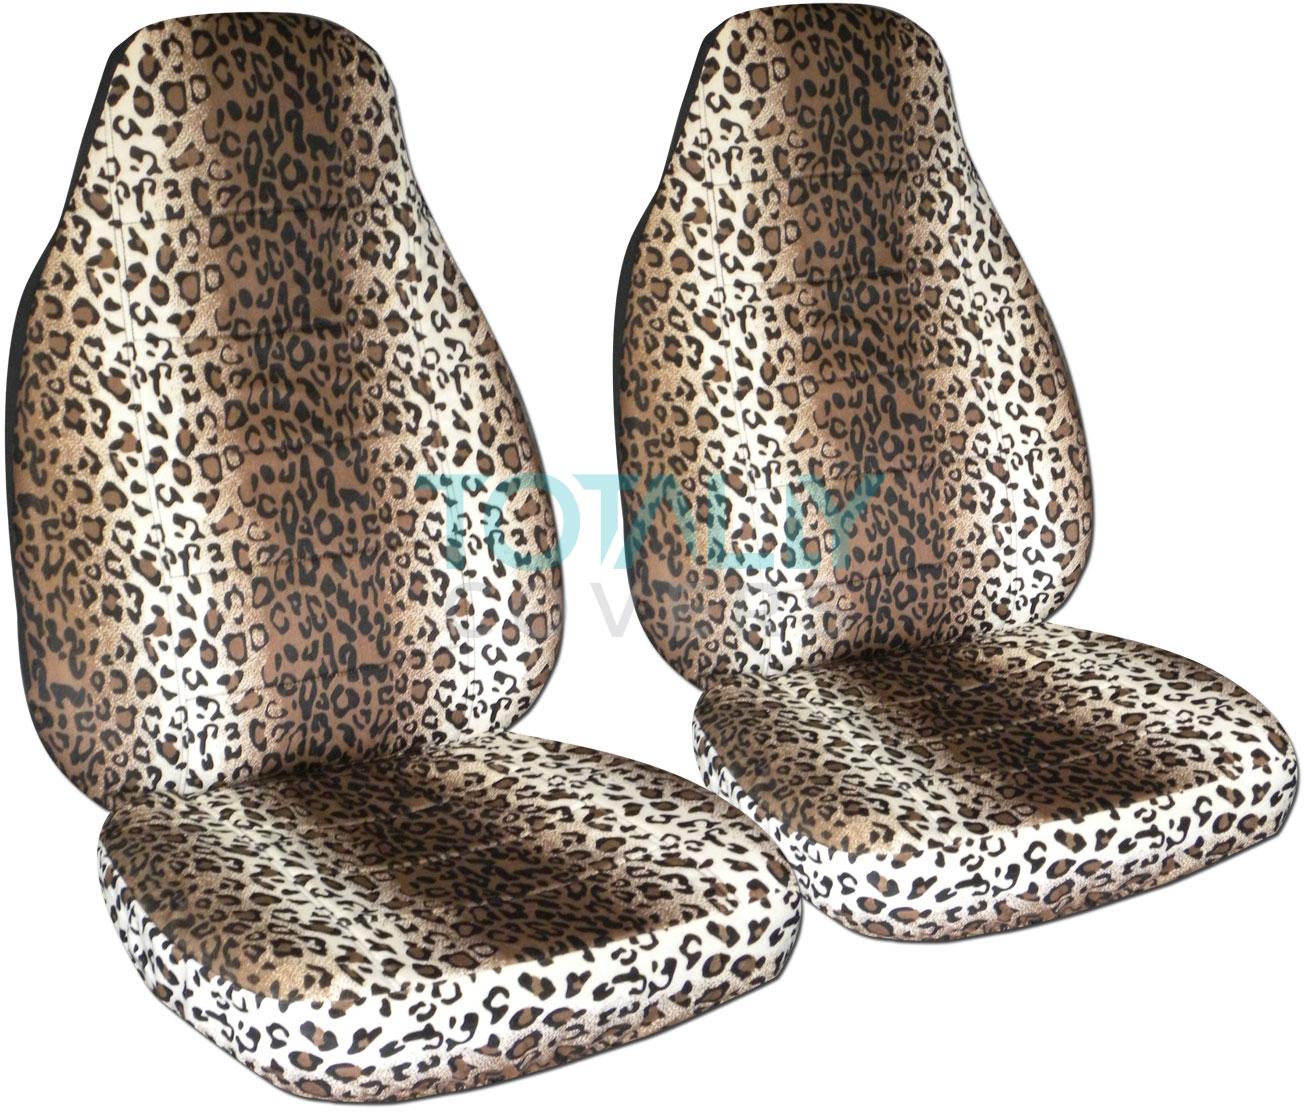 Leopard Print Car Seats Covers